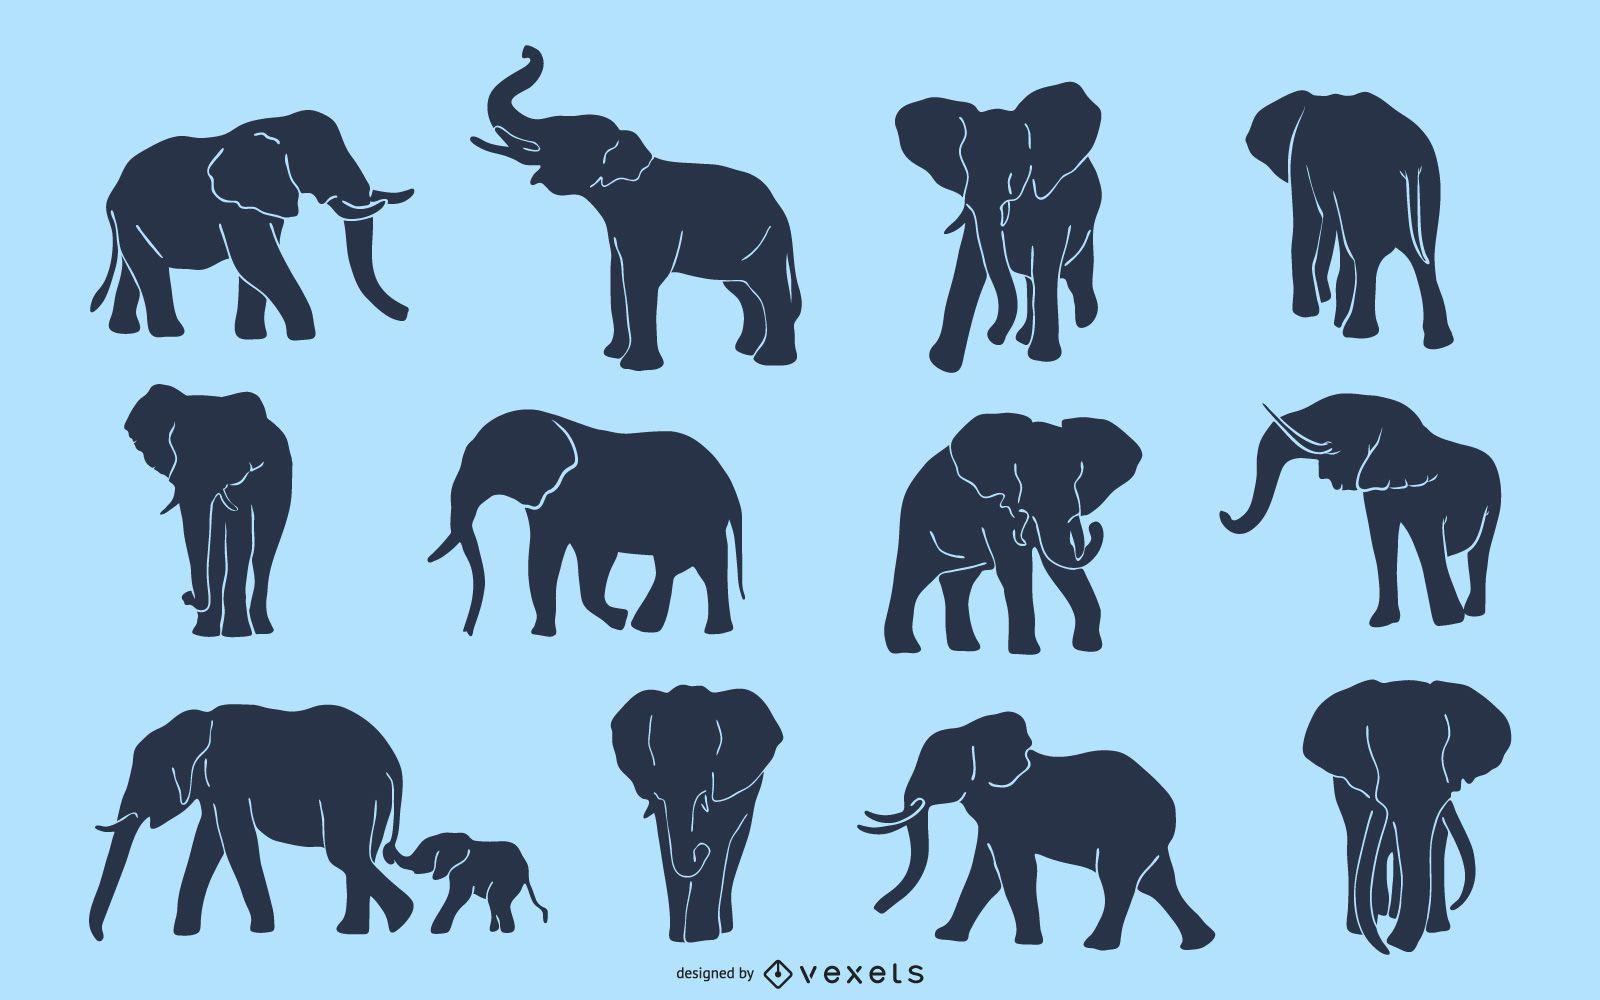 Paquete de diseño de silueta de elefante